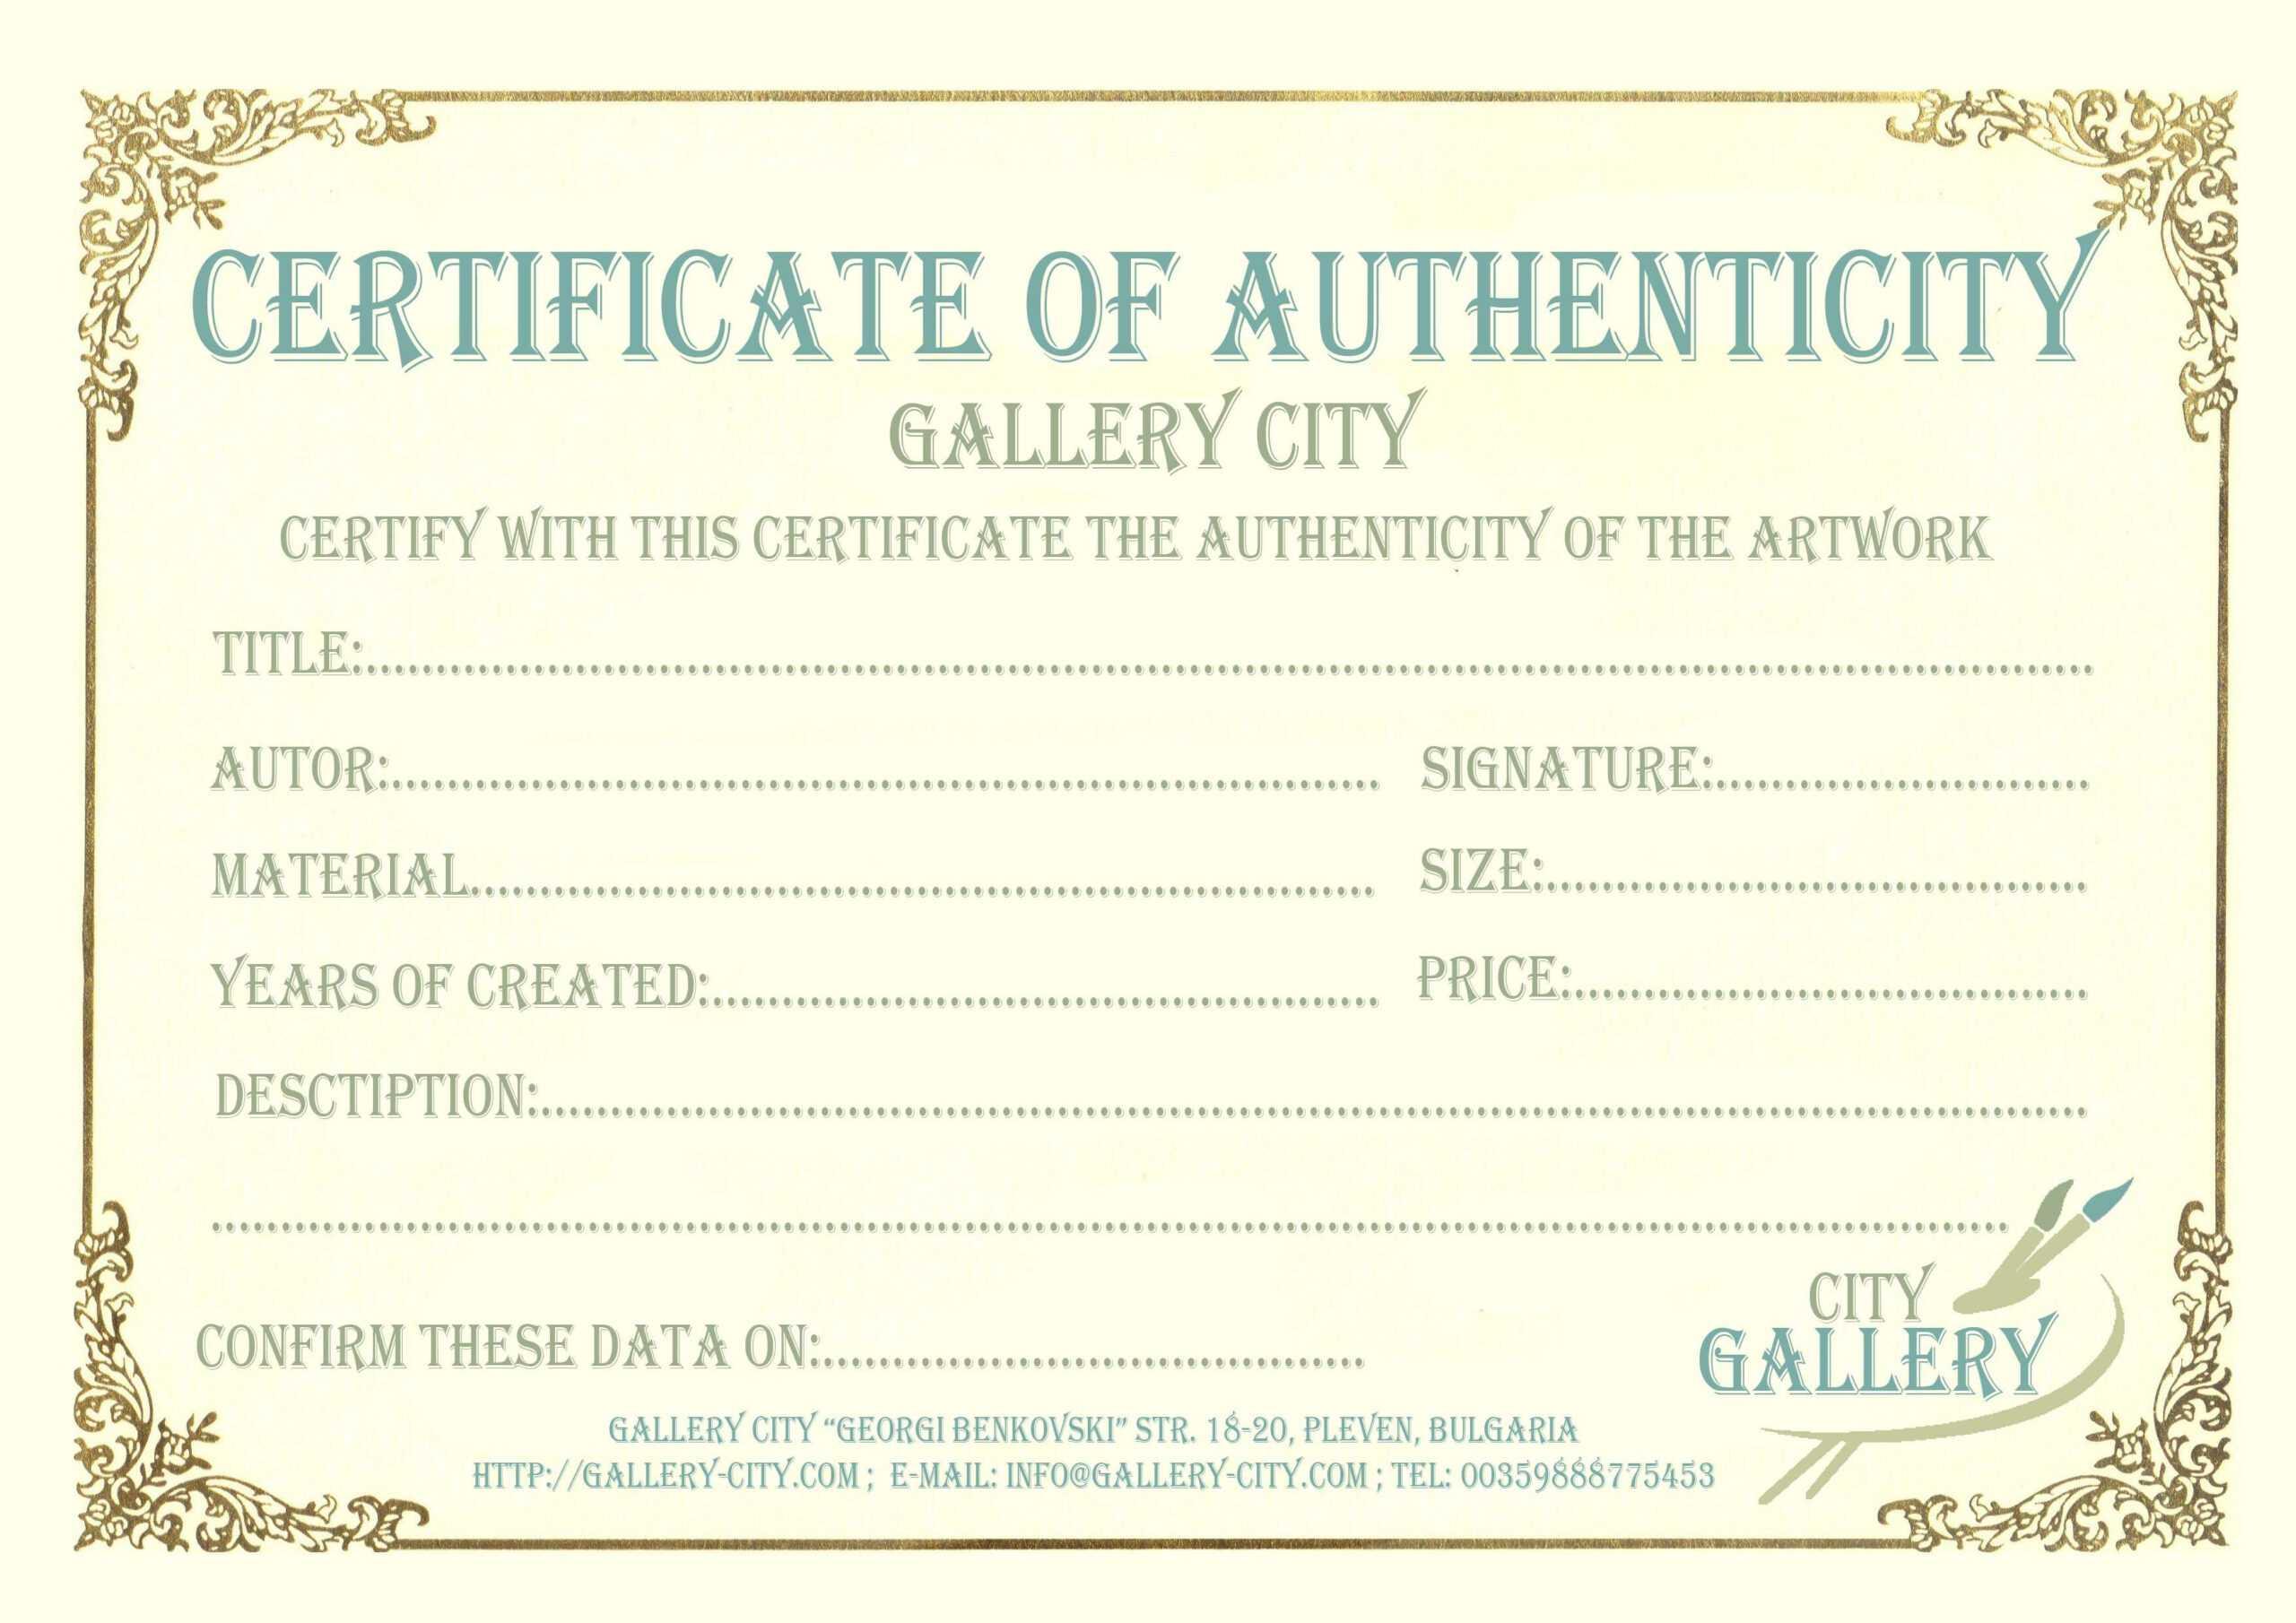 Certificate Authenticity Template Art Authenticity Throughout Certificate Of Authenticity Template